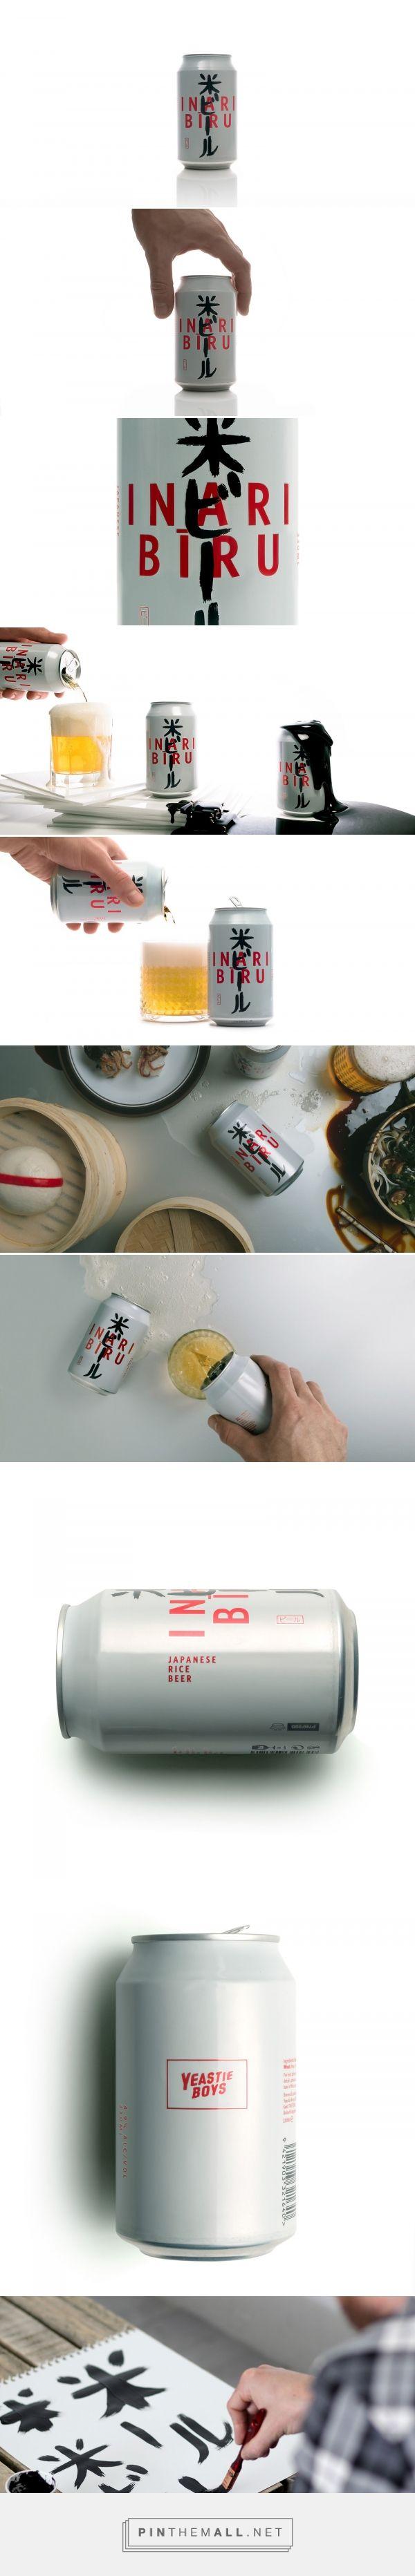 Inari Biru - Packaging of the World - Creative Package Design Gallery - http://www.packagingoftheworld.com/2017/09/inari-biru.html